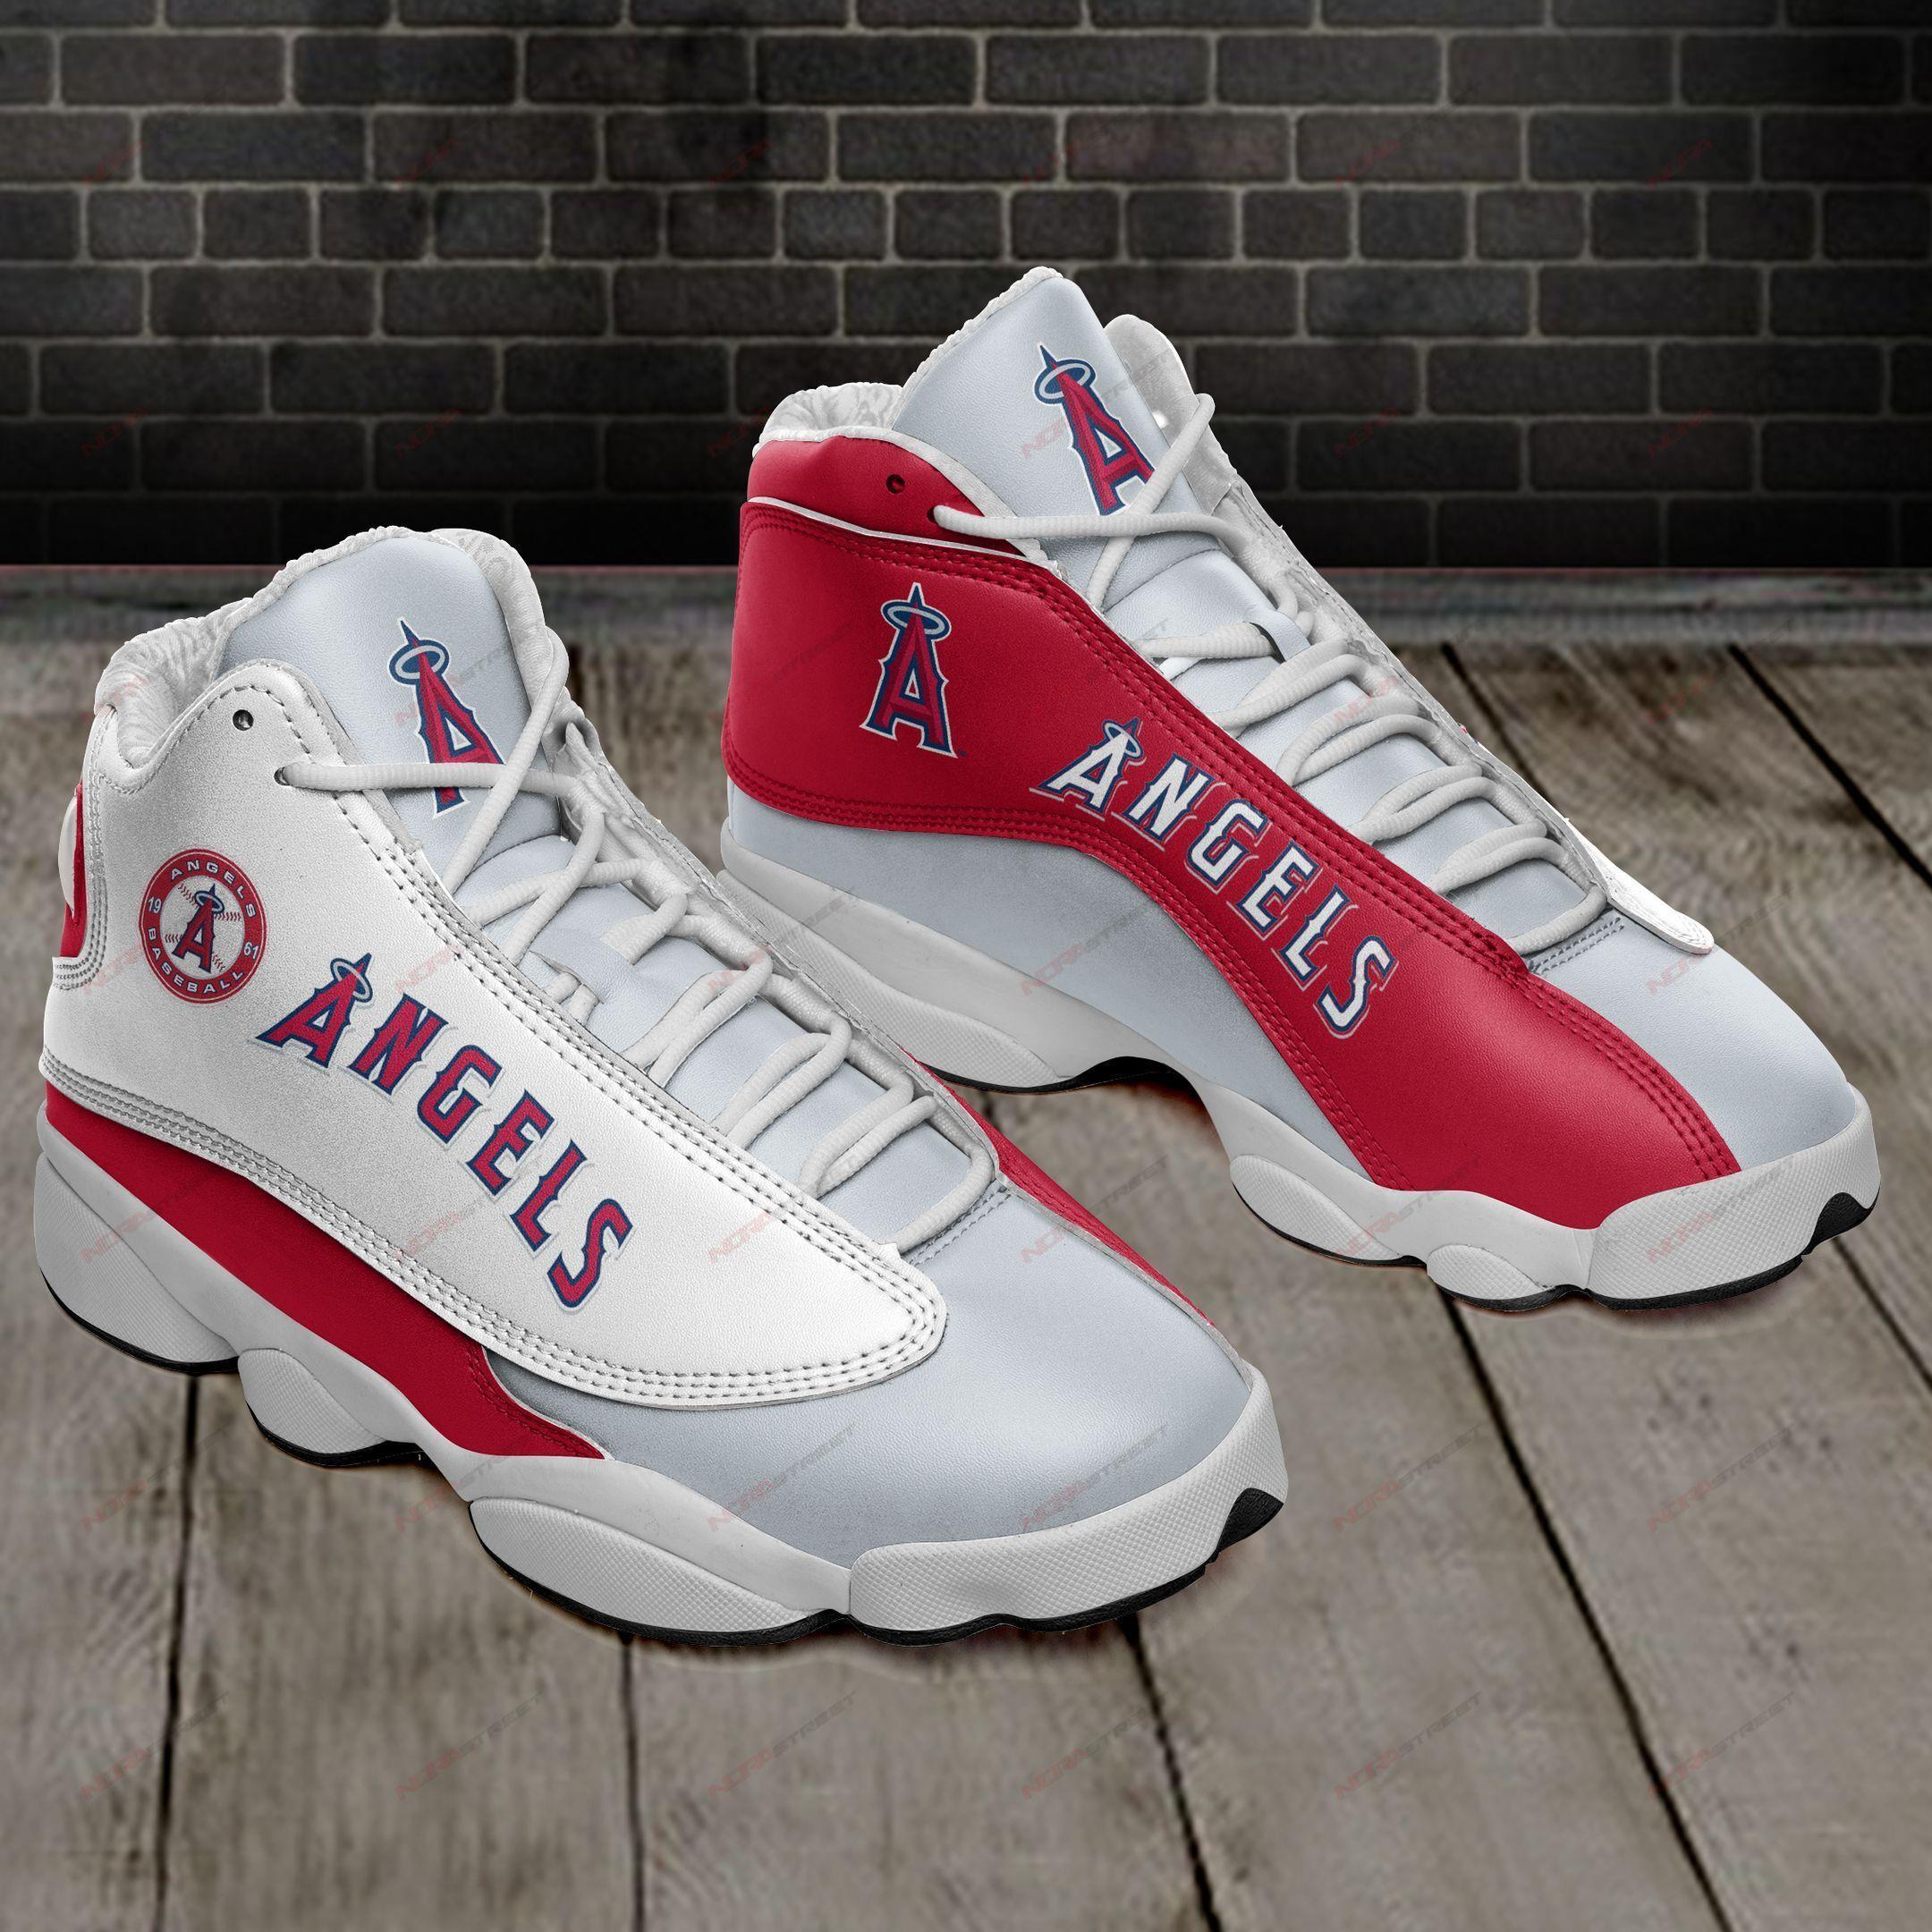 Los Angeles Angels Of Anaheim Air Jordan 13 Sneakers Sport Shoes Full Size